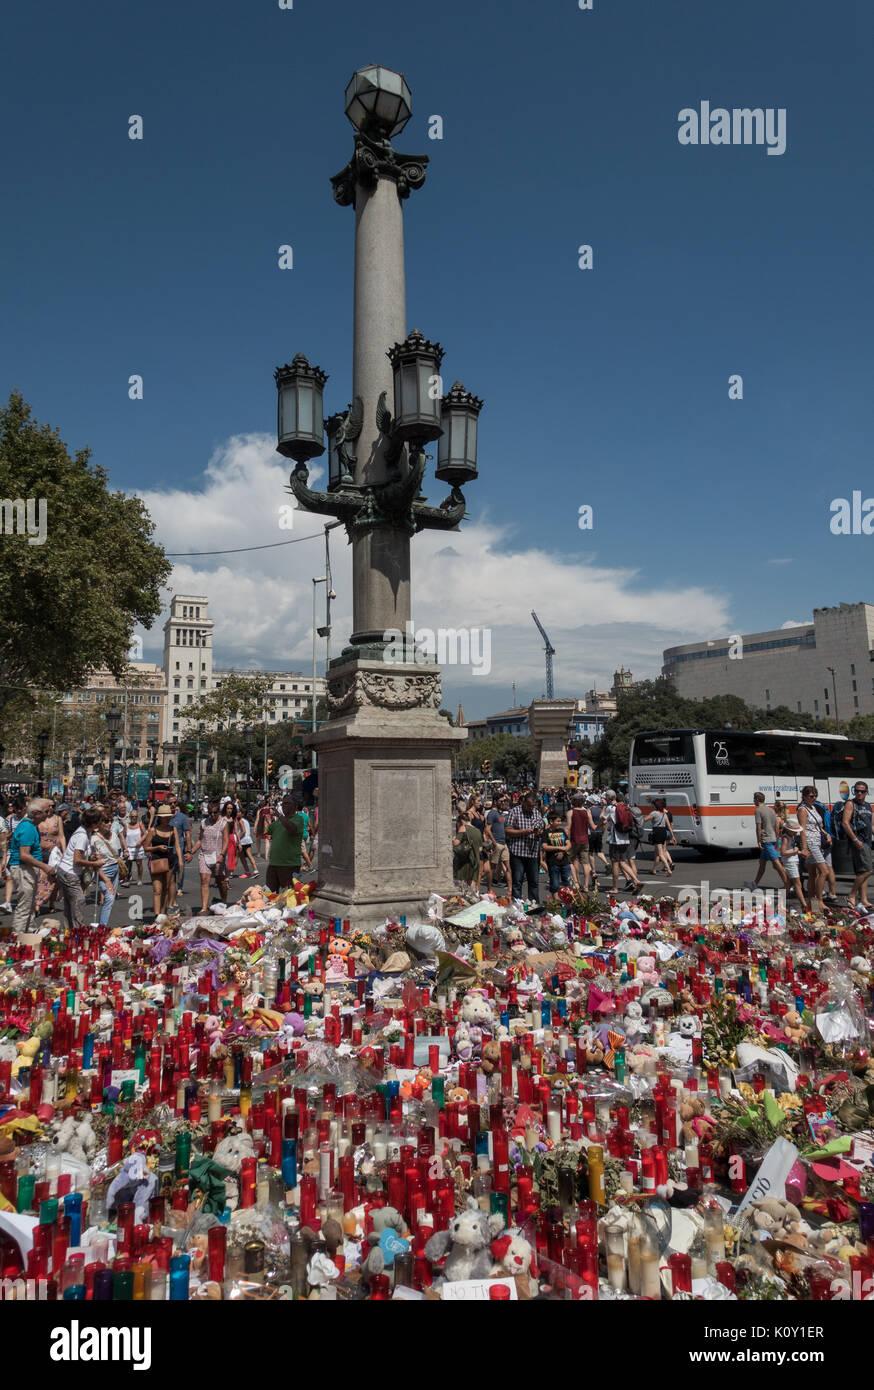 Memorial for victims of terror attacks in Las Ramblas in Barcelona,piety place,candles,terrorist attack Stock Photo